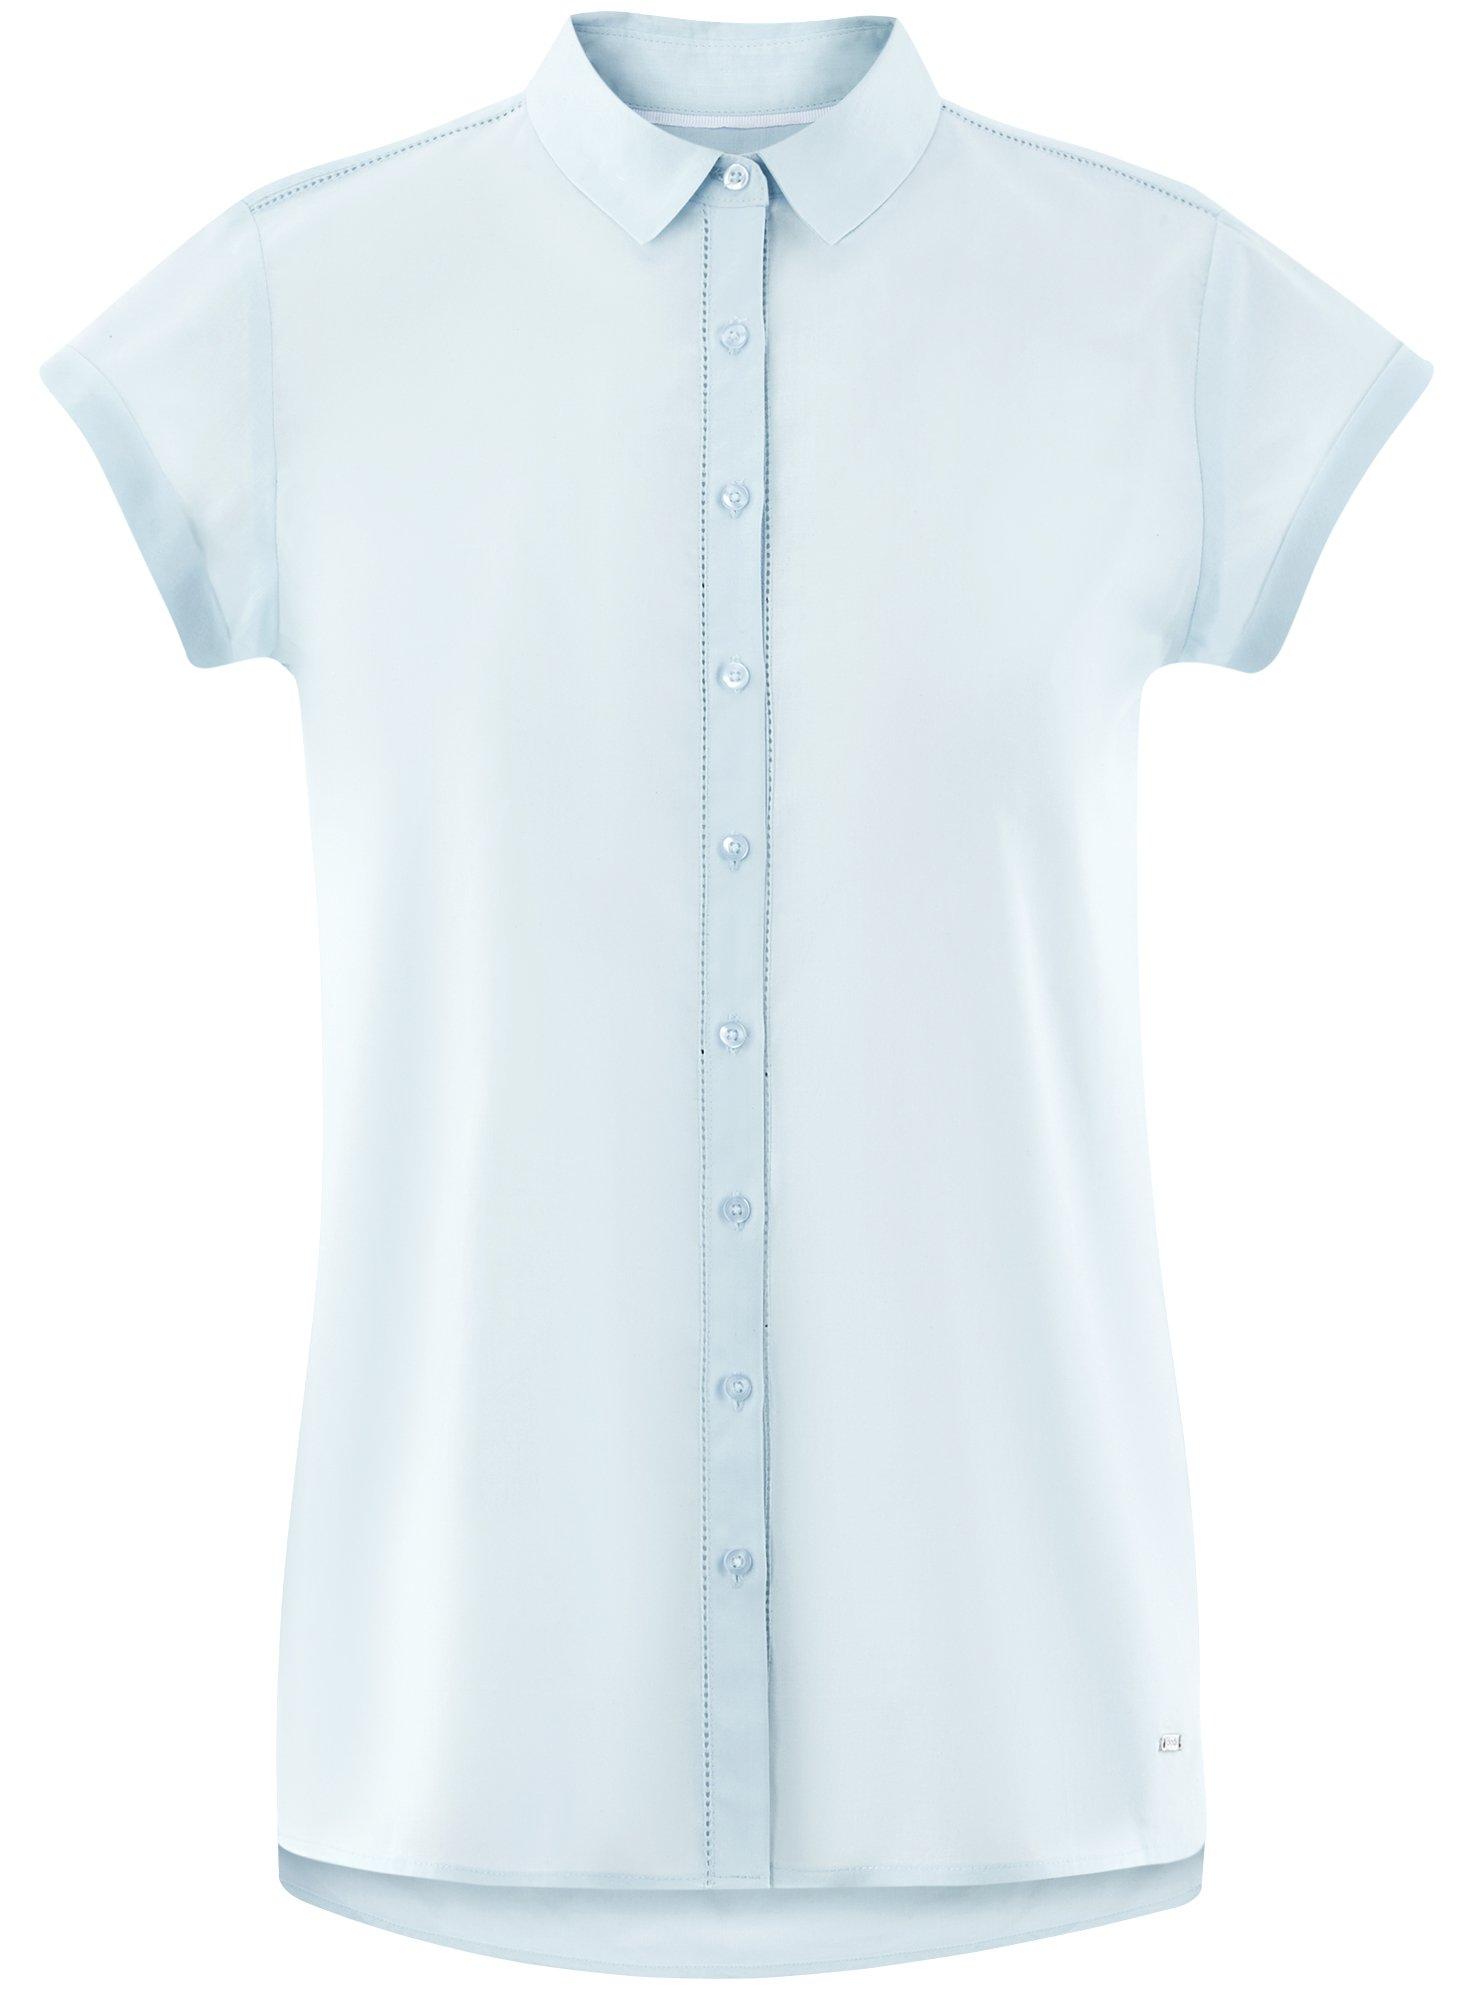 oodji Ultra Women's Short Sleeve Cotton Shirt with Turn-Ups, Blue, 2 by oodji (Image #7)